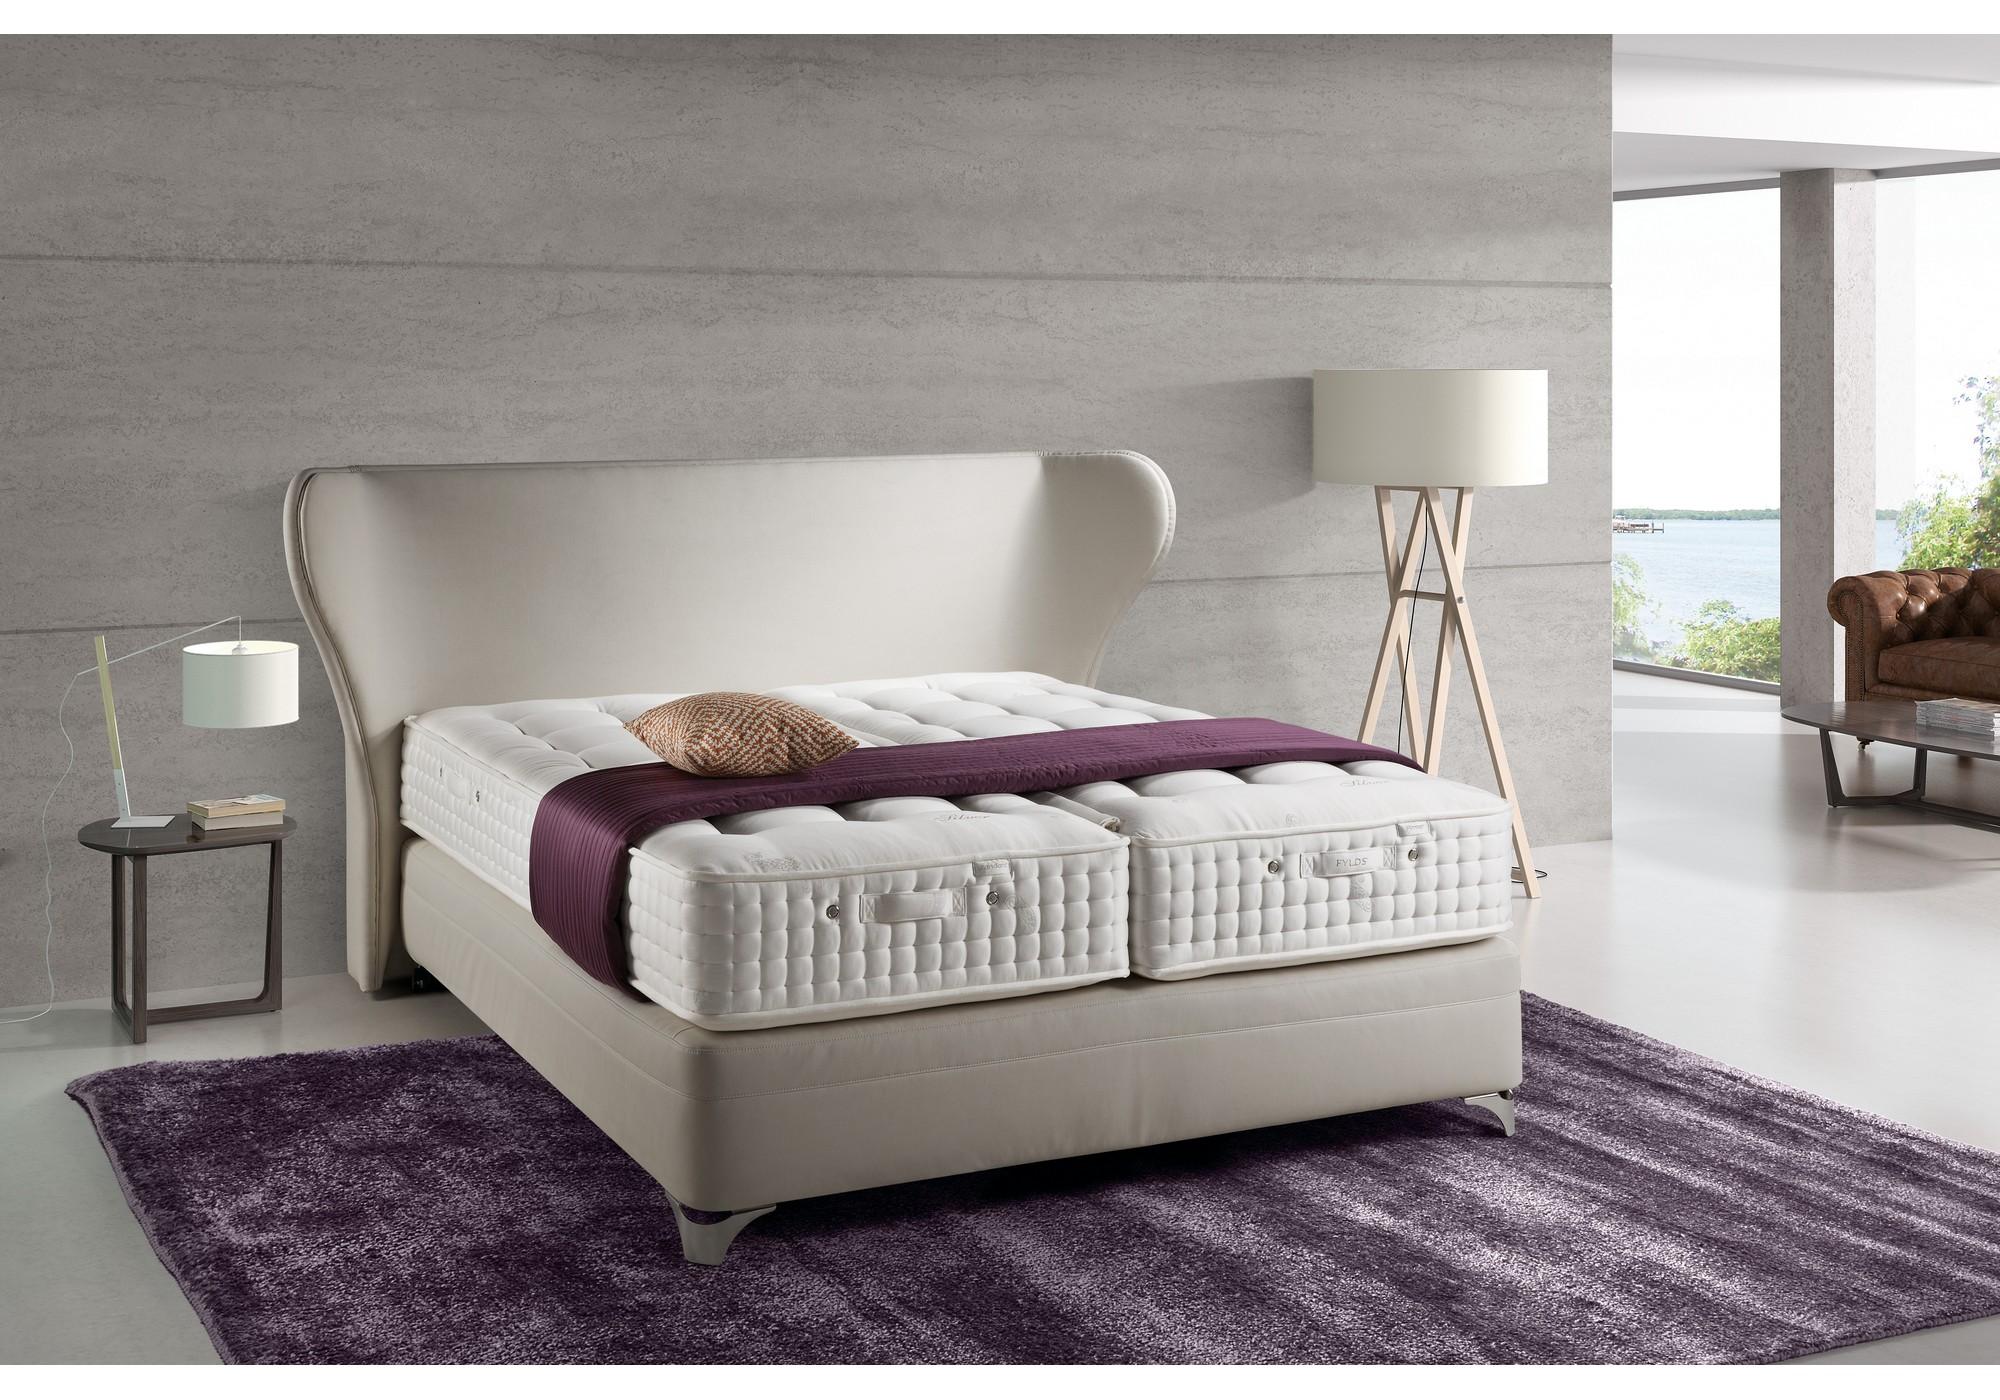 fylds boxspringbett mit kopfteil cr vecoeur betten kraft. Black Bedroom Furniture Sets. Home Design Ideas